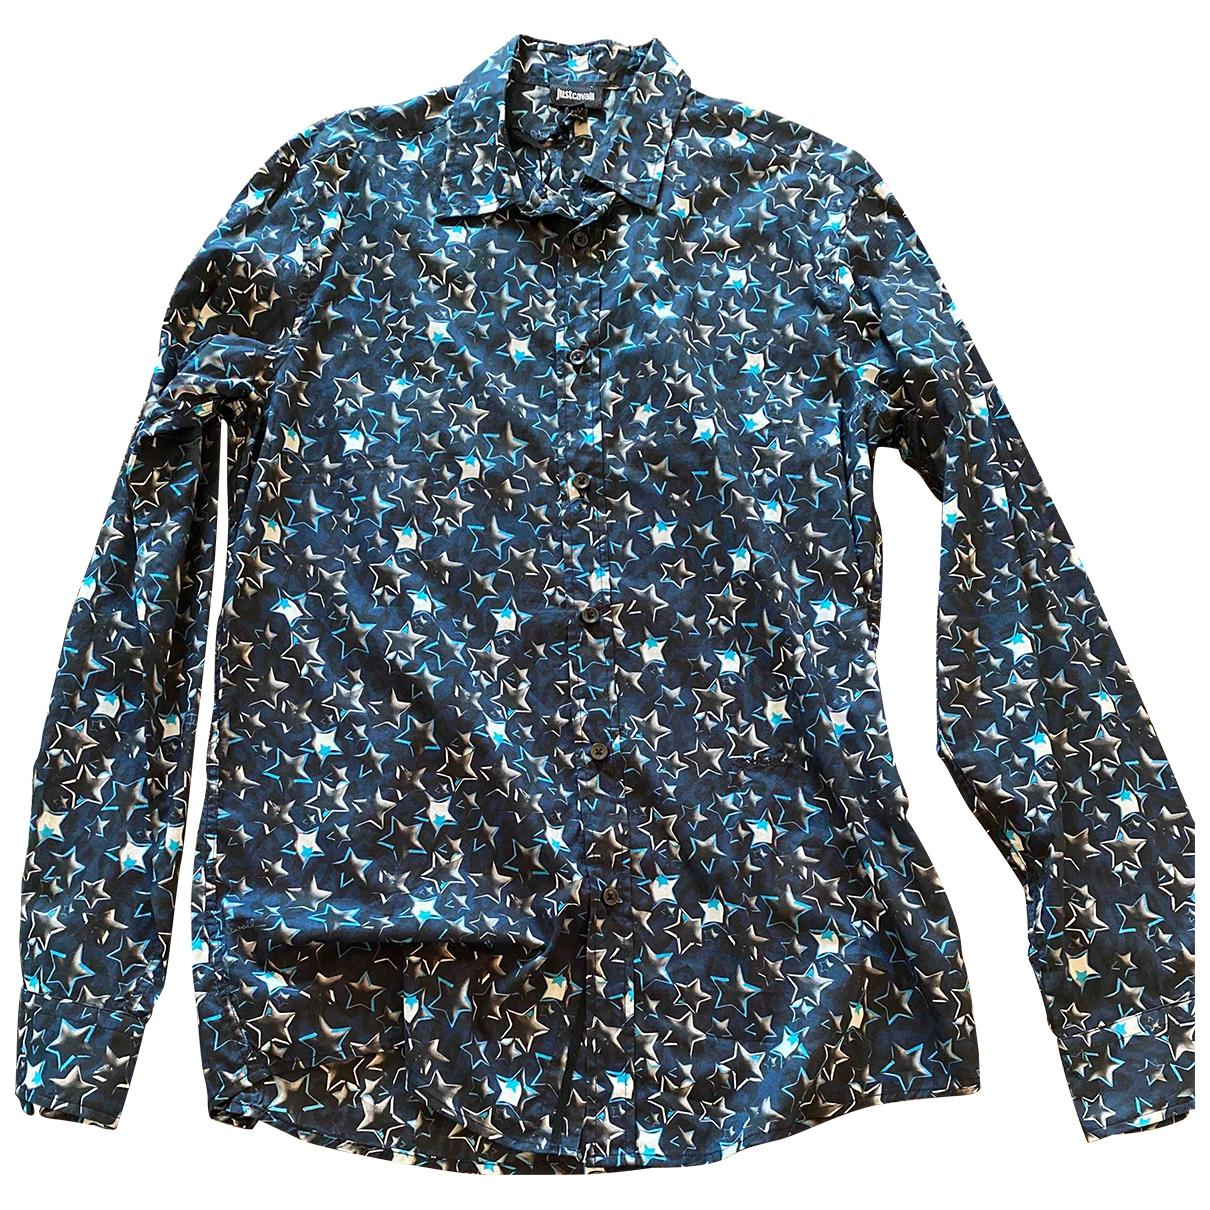 Just Cavalli \N Navy Cotton Shirts for Men M International